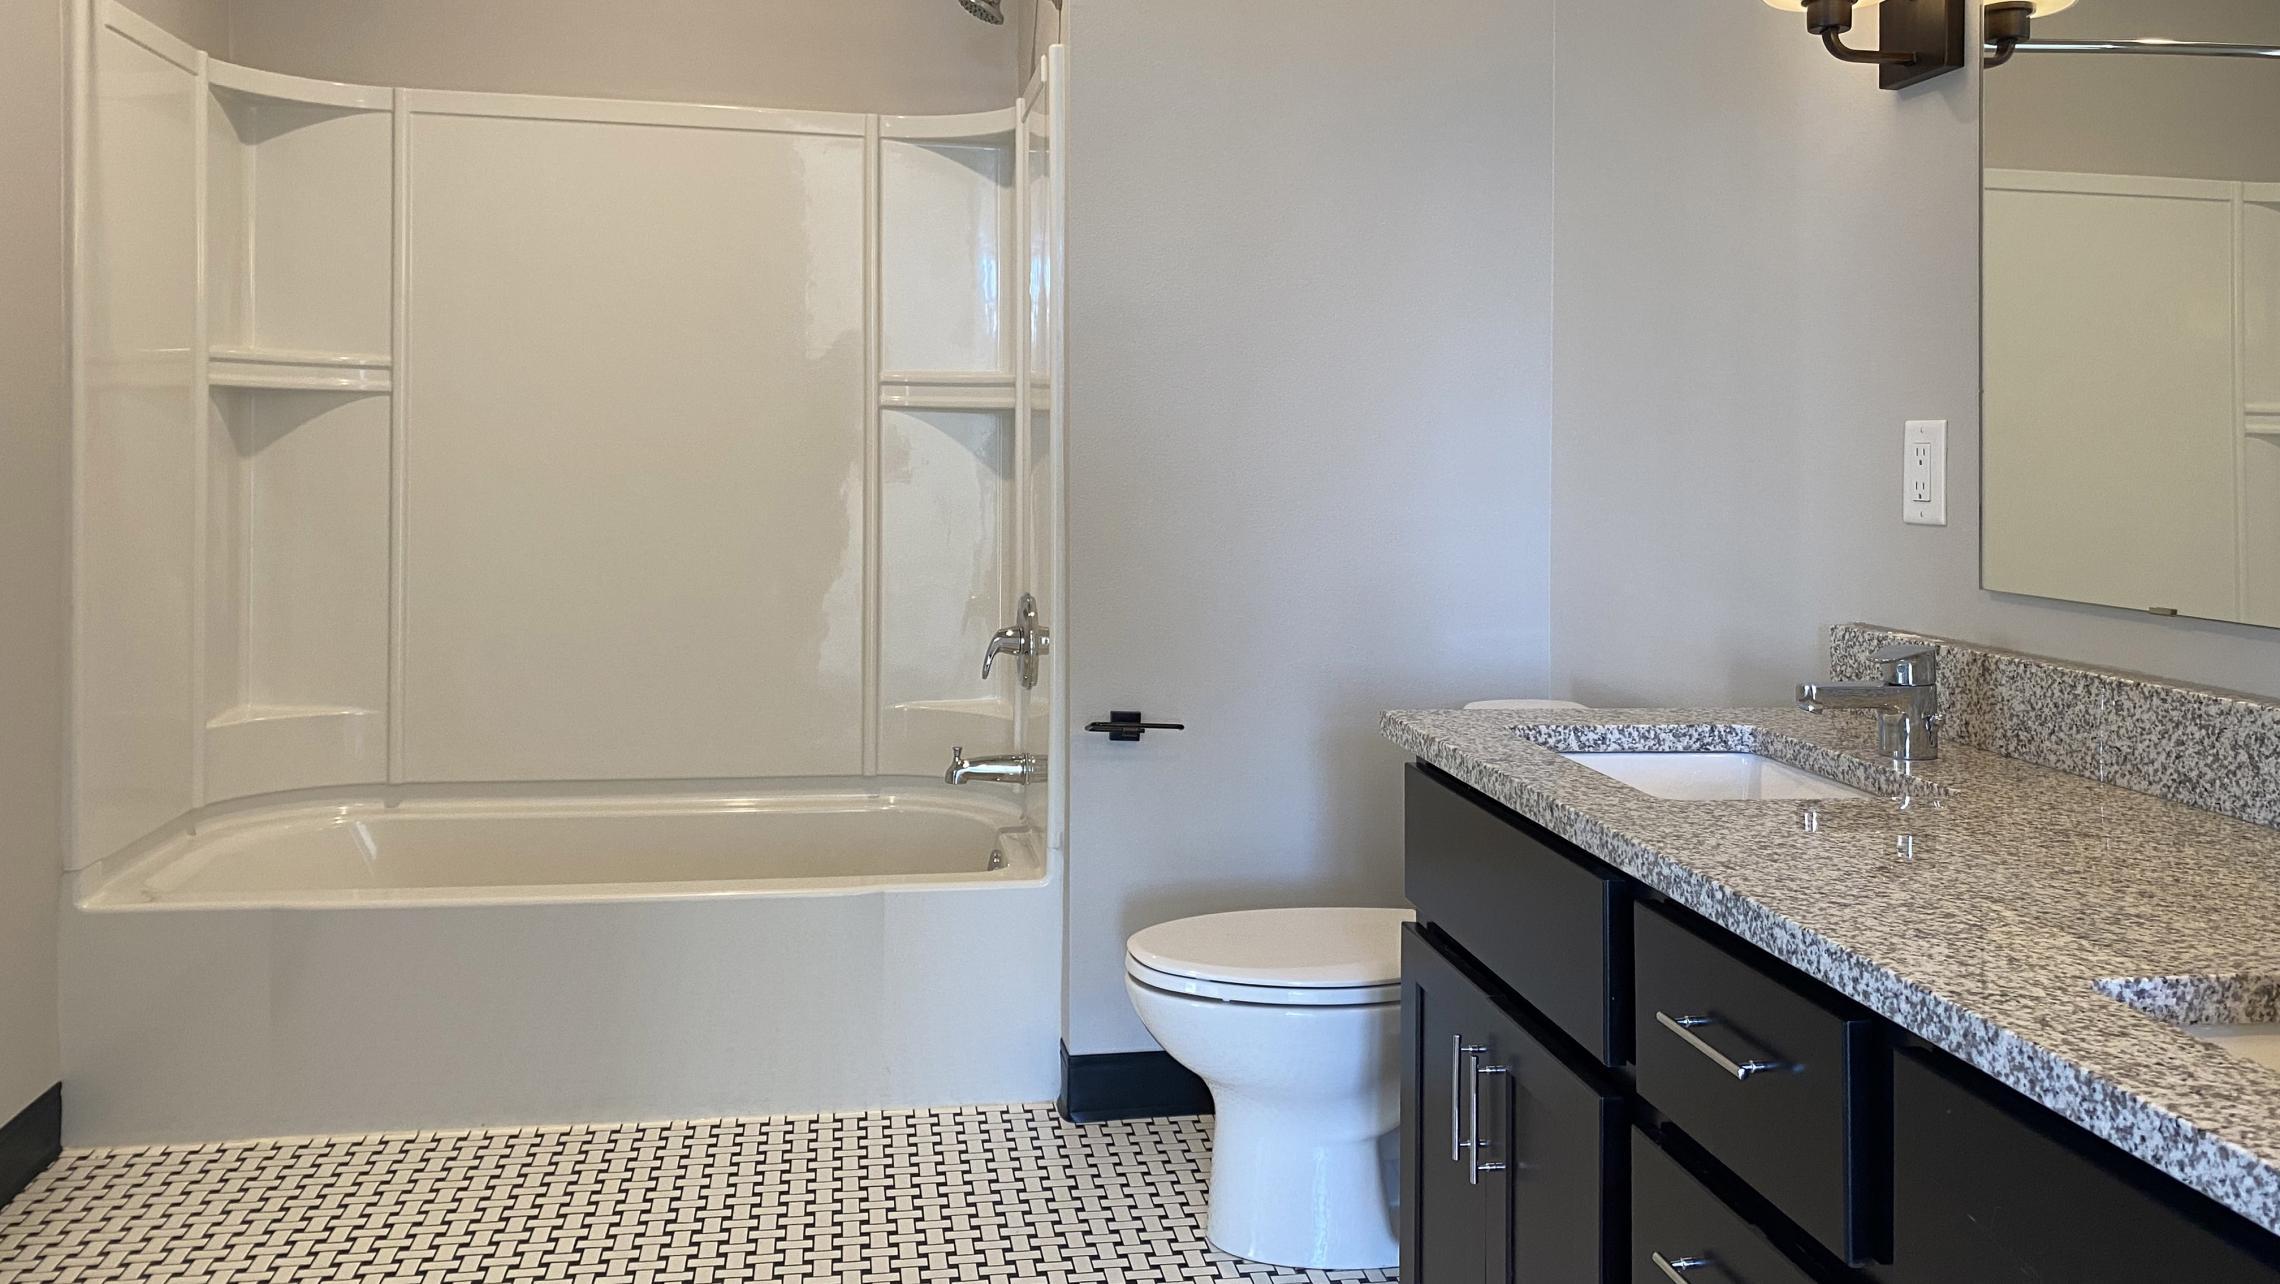 1722-Monroe-Apartments-419-Three-Bedroom-Modern-Upscale-Design-Windows-Natural-Light-Gym-Terrace-Living-Luxury-Lounge-Madison-Bathroom-Vanity-Soaking-Tub